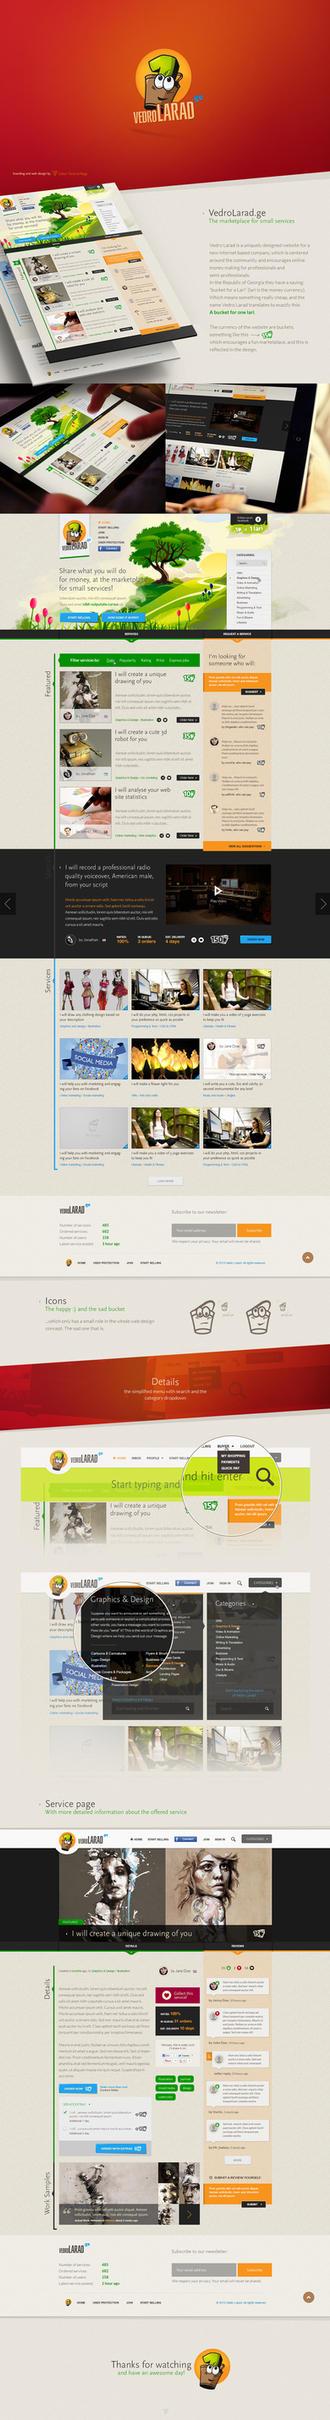 Branding and Web Design - Vedro Larad by Tngabor